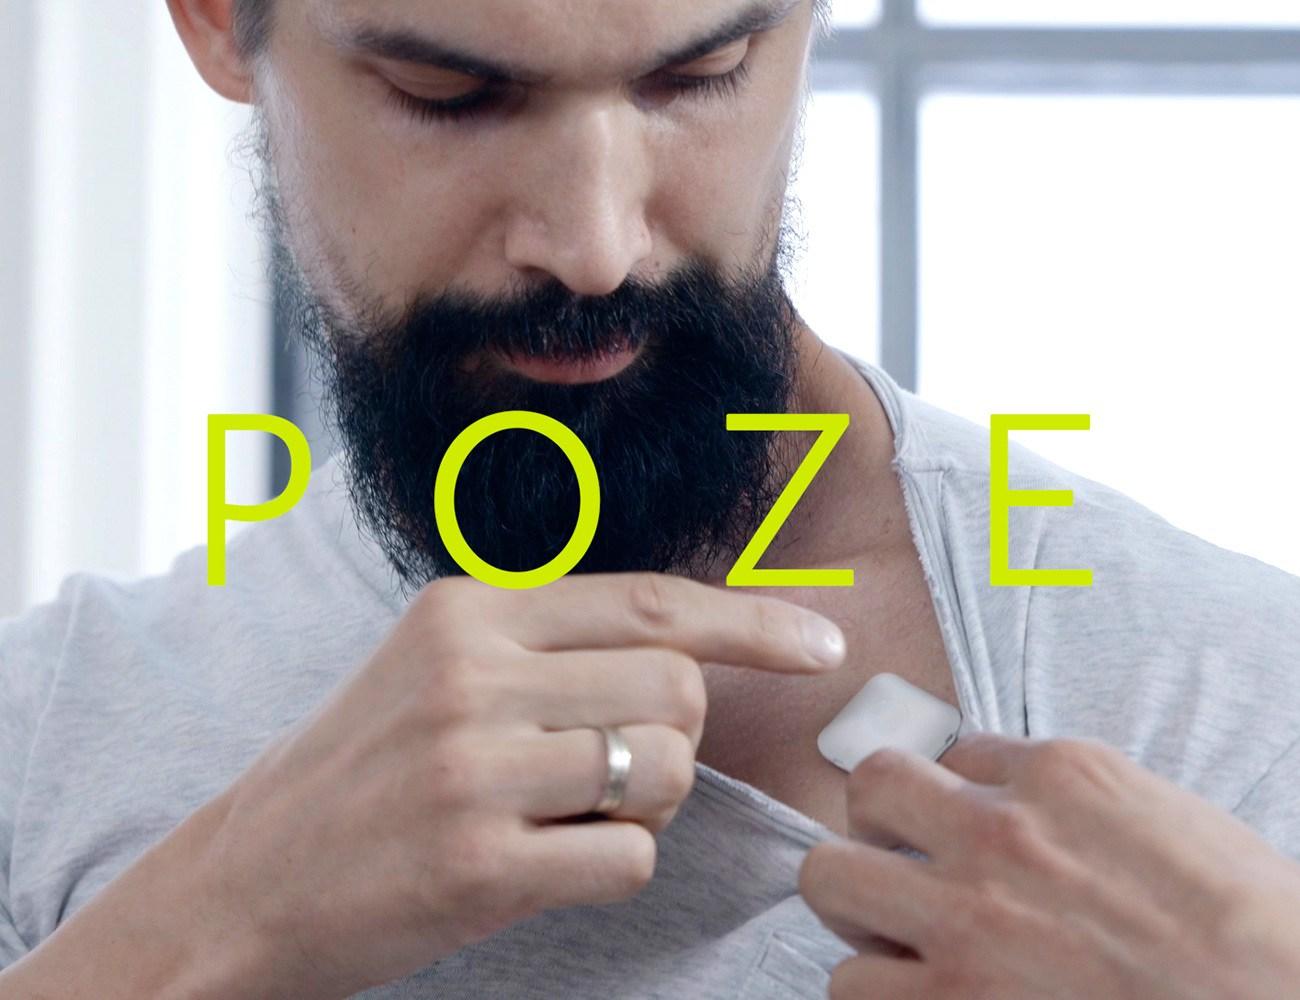 POZE- The Ultimate Posture Coach